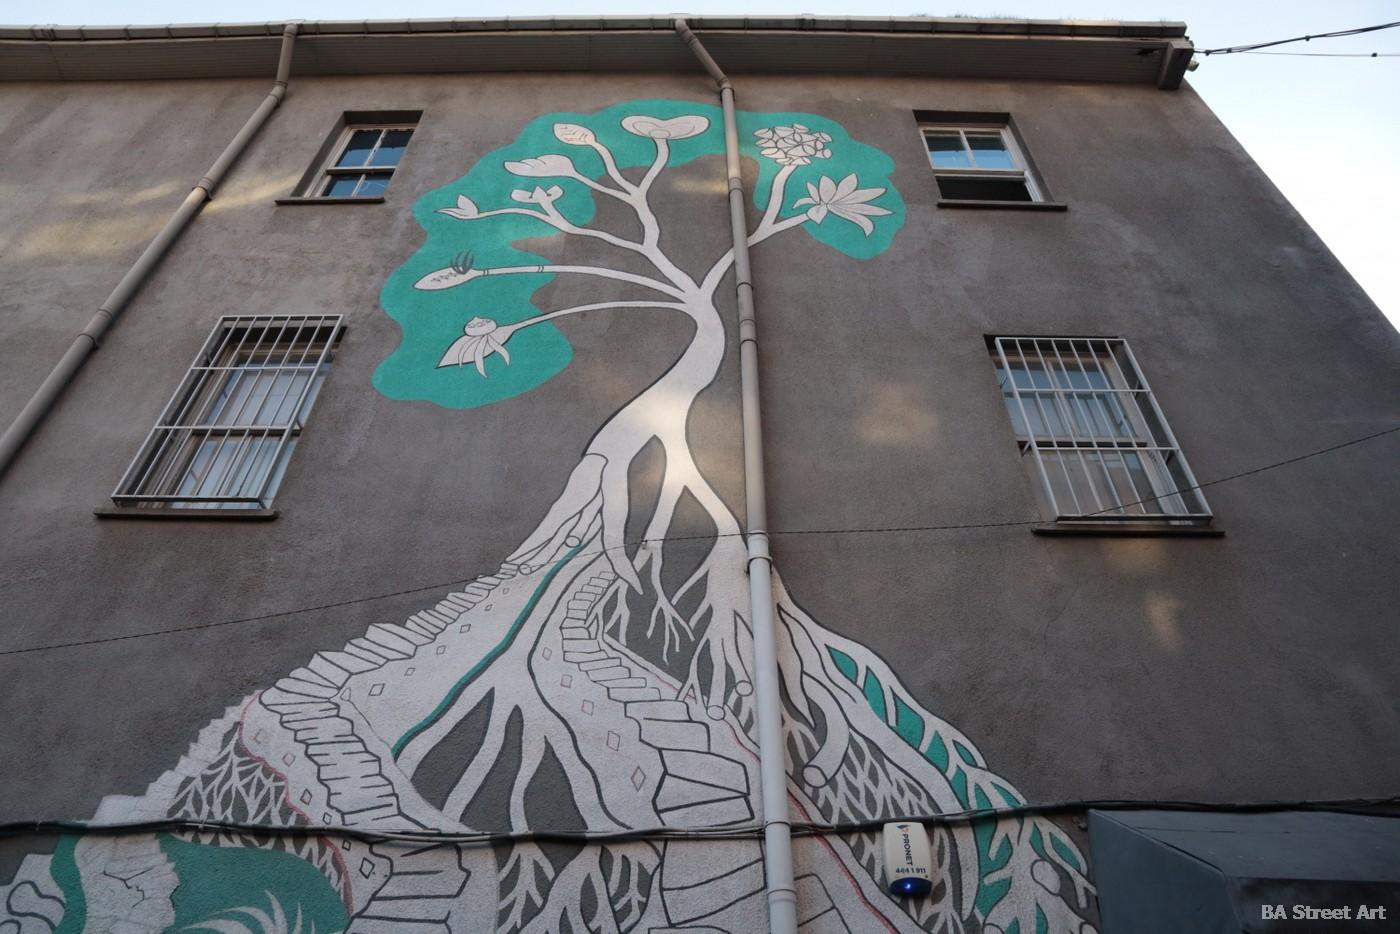 maria bedoian istanbul DEPO building tophane galata artista argentine artist mural torre tower babel turkey turquia buenosairesstreetart.com.jpg